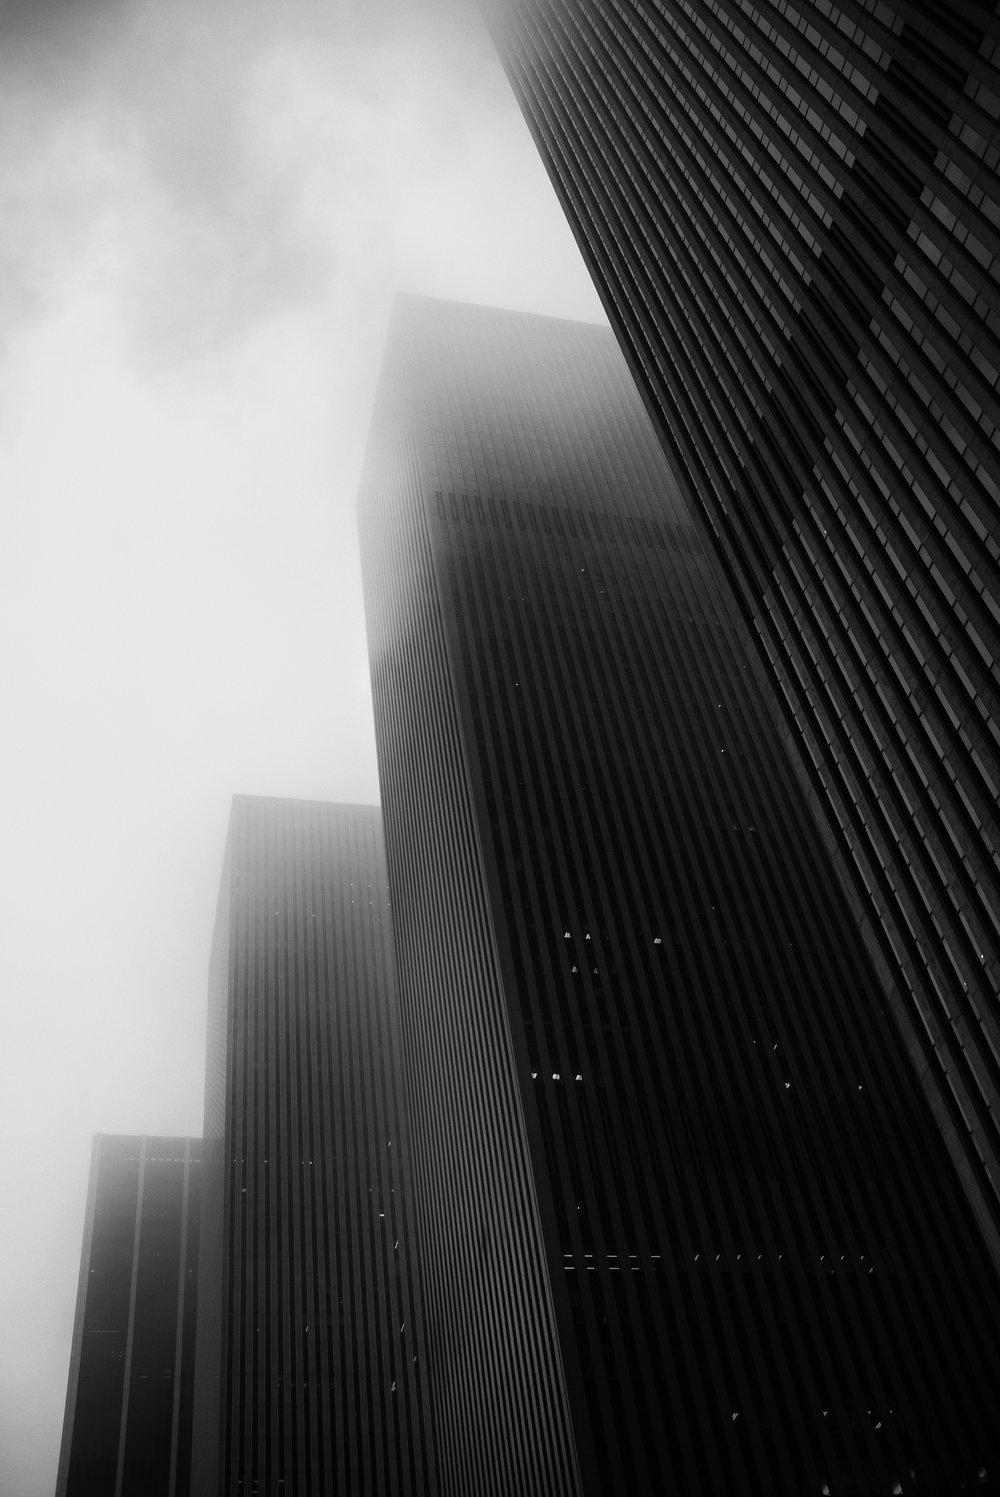 180404_NYC_Views_014.jpg